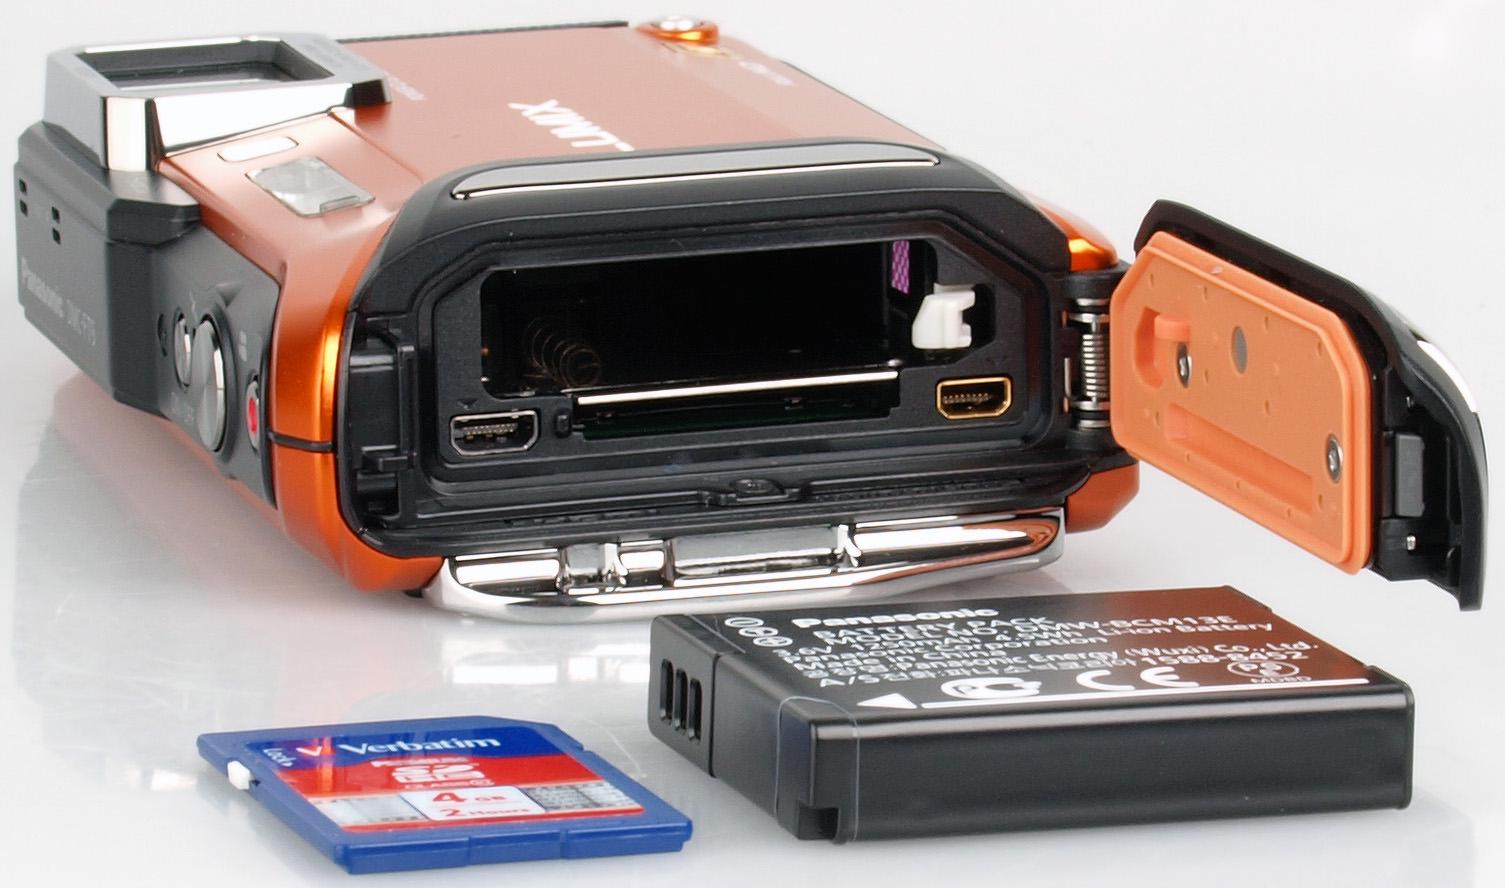 Panasonic Lumix DMC-FT5 Digital Camera Review